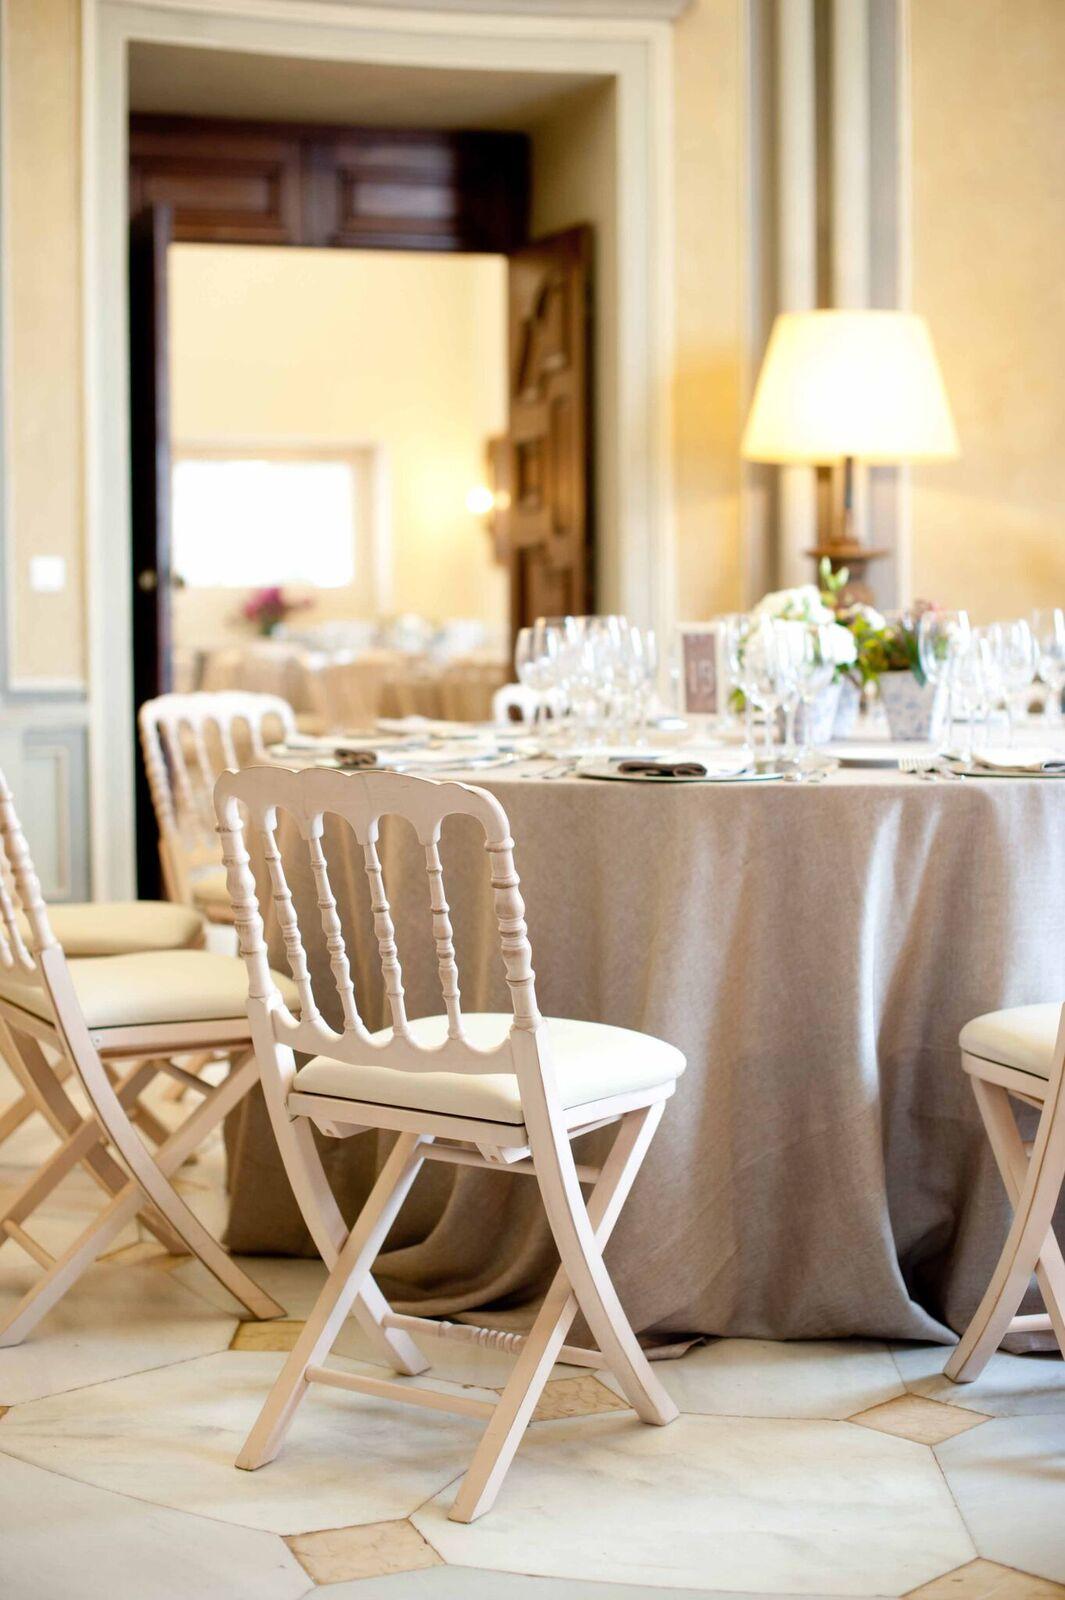 Si-Quiero-Wedding-Planner-Sira-Antequera-Patricia-Javier-008